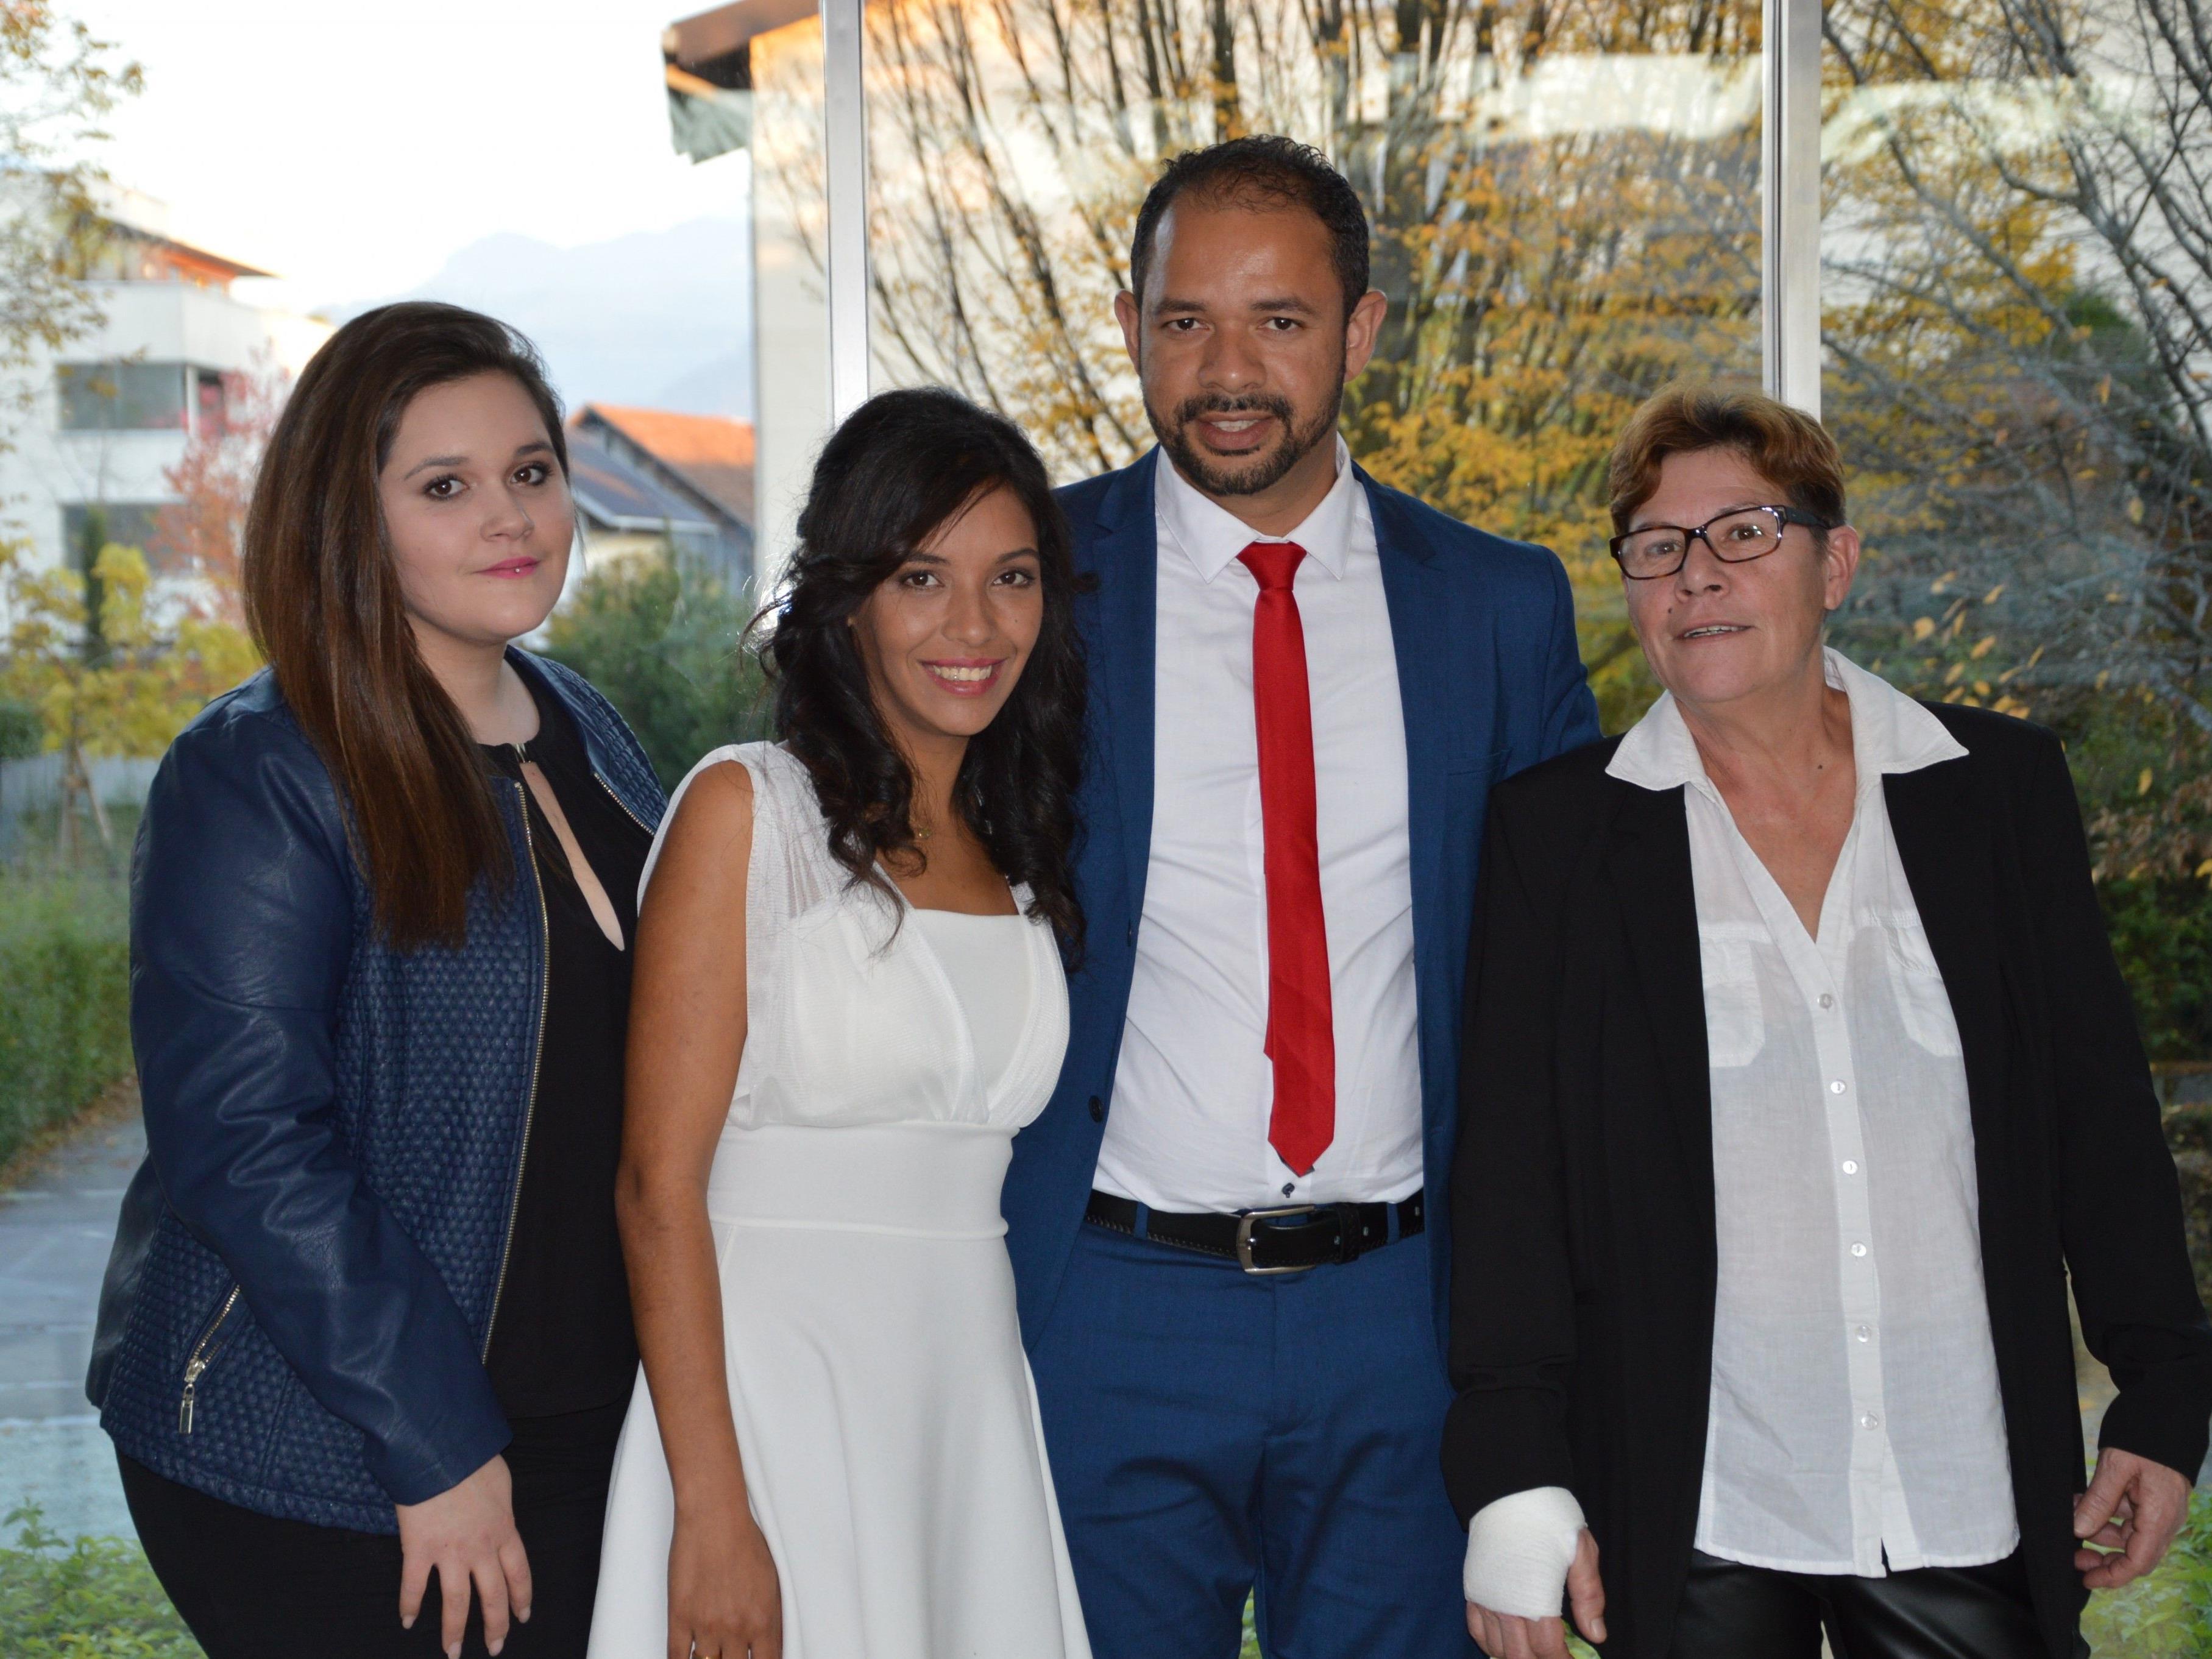 Lenir Silva da Rosa und Josue Francisco do Nascimento haben geheiratet